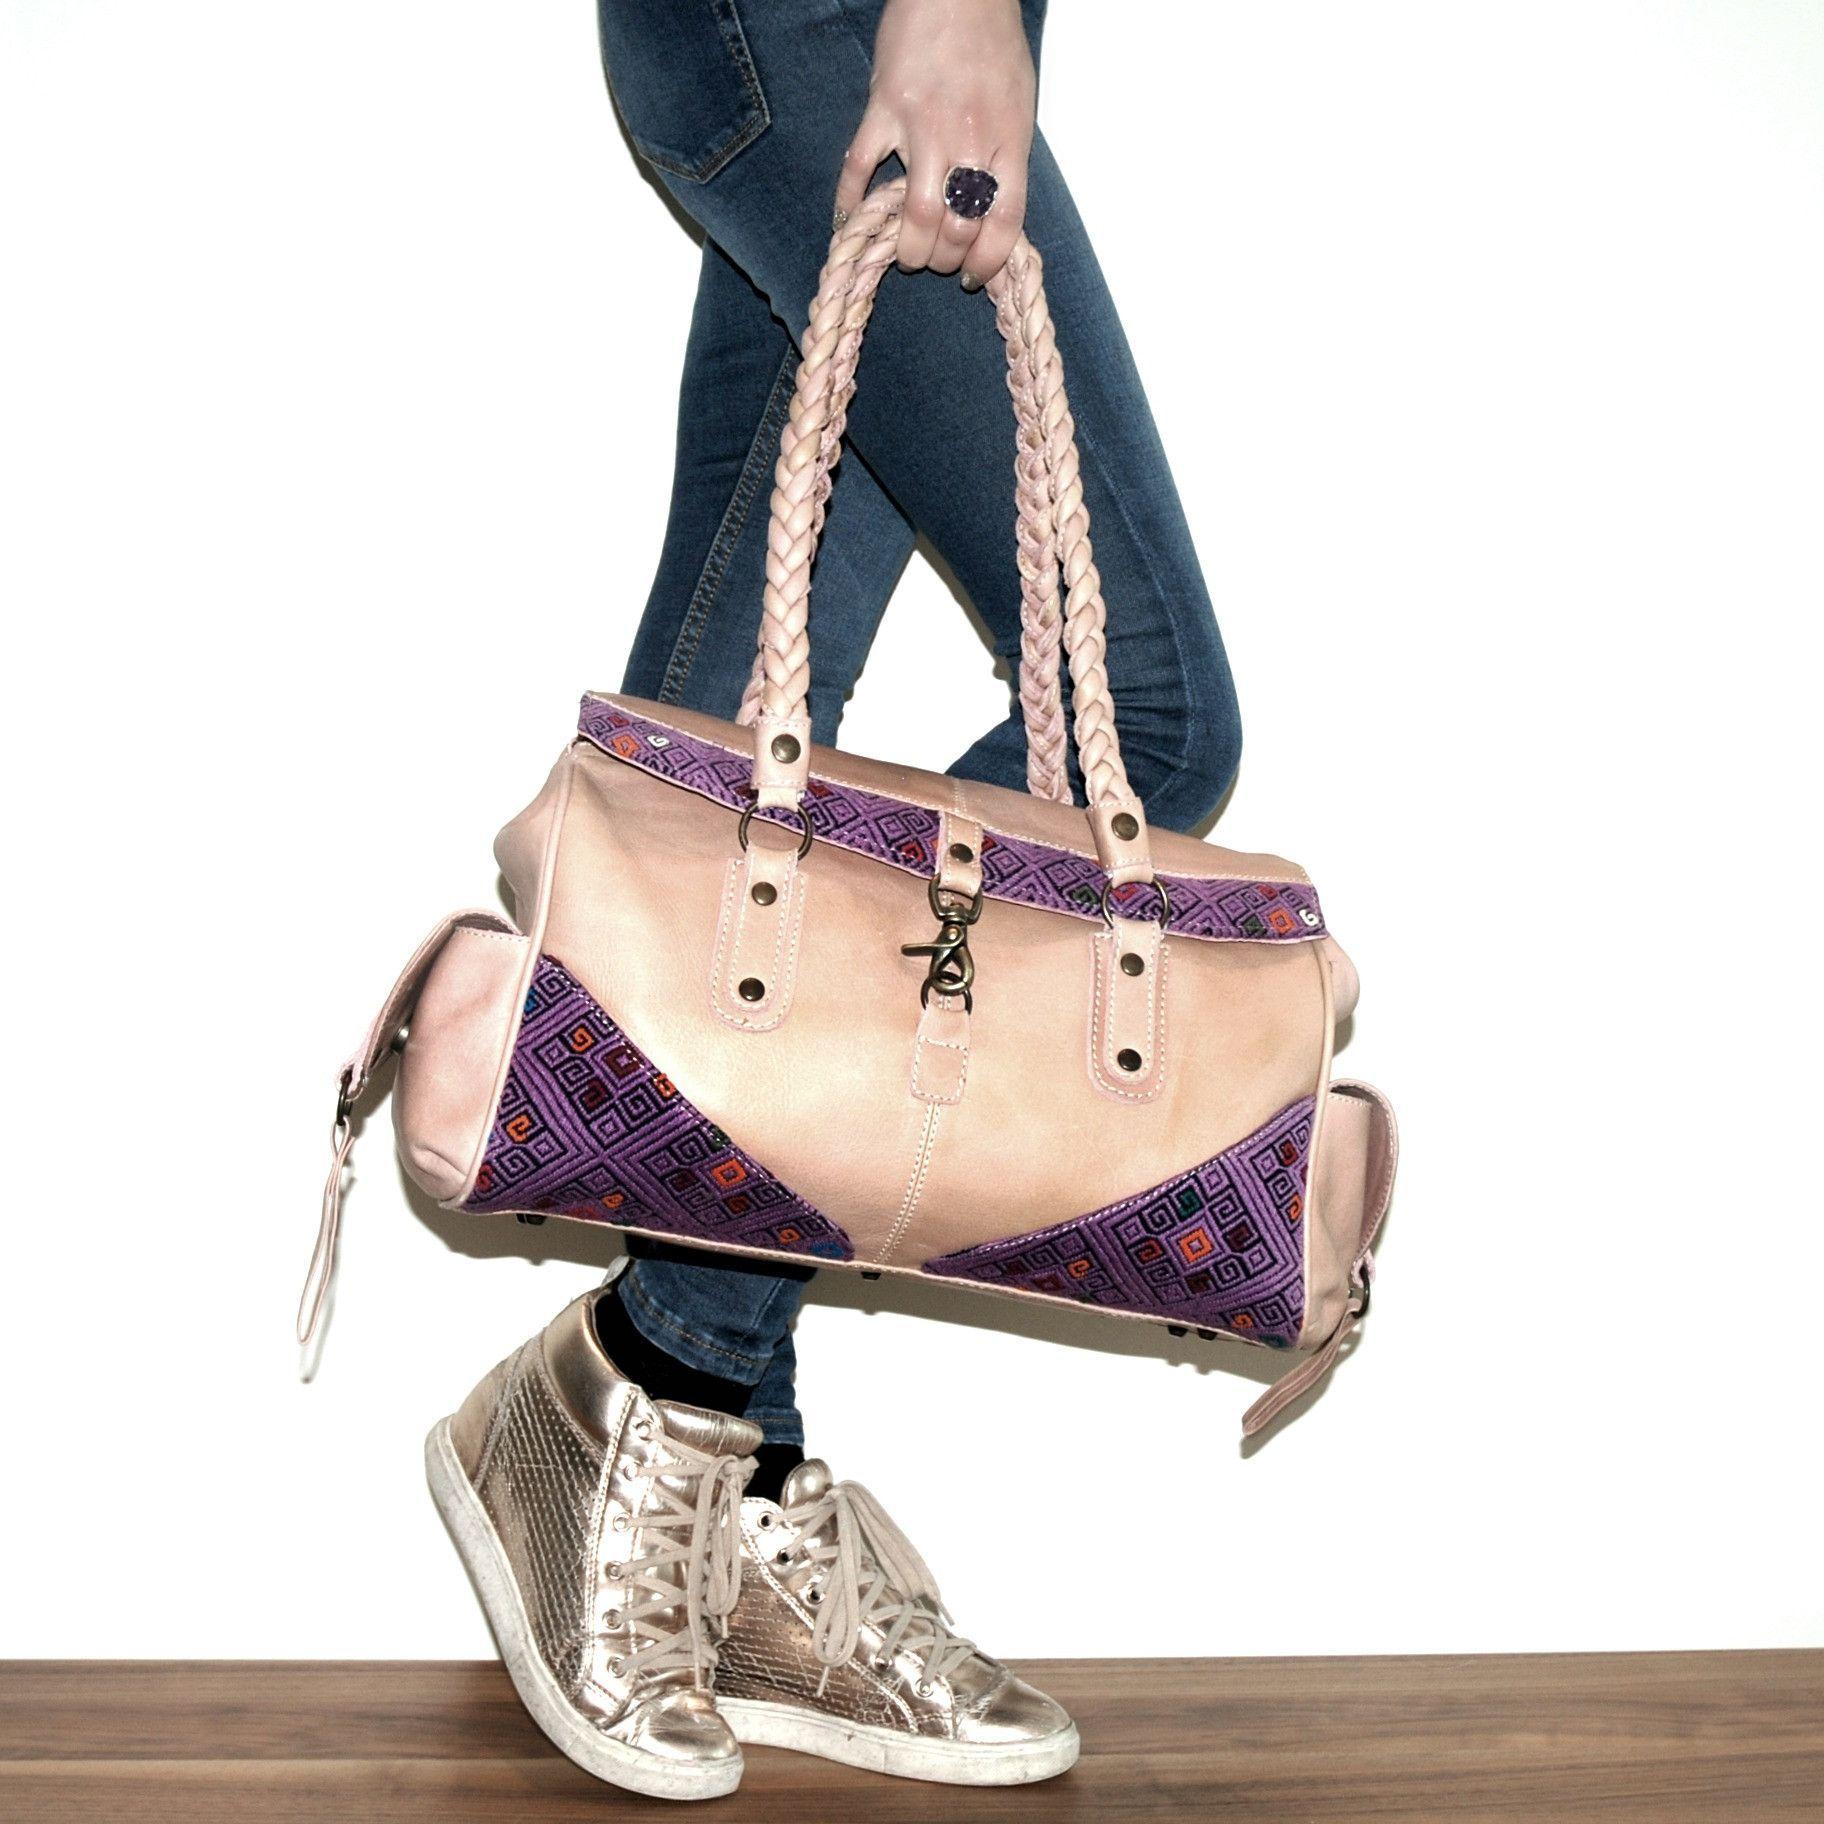 Duvalin handbag products pinterest products